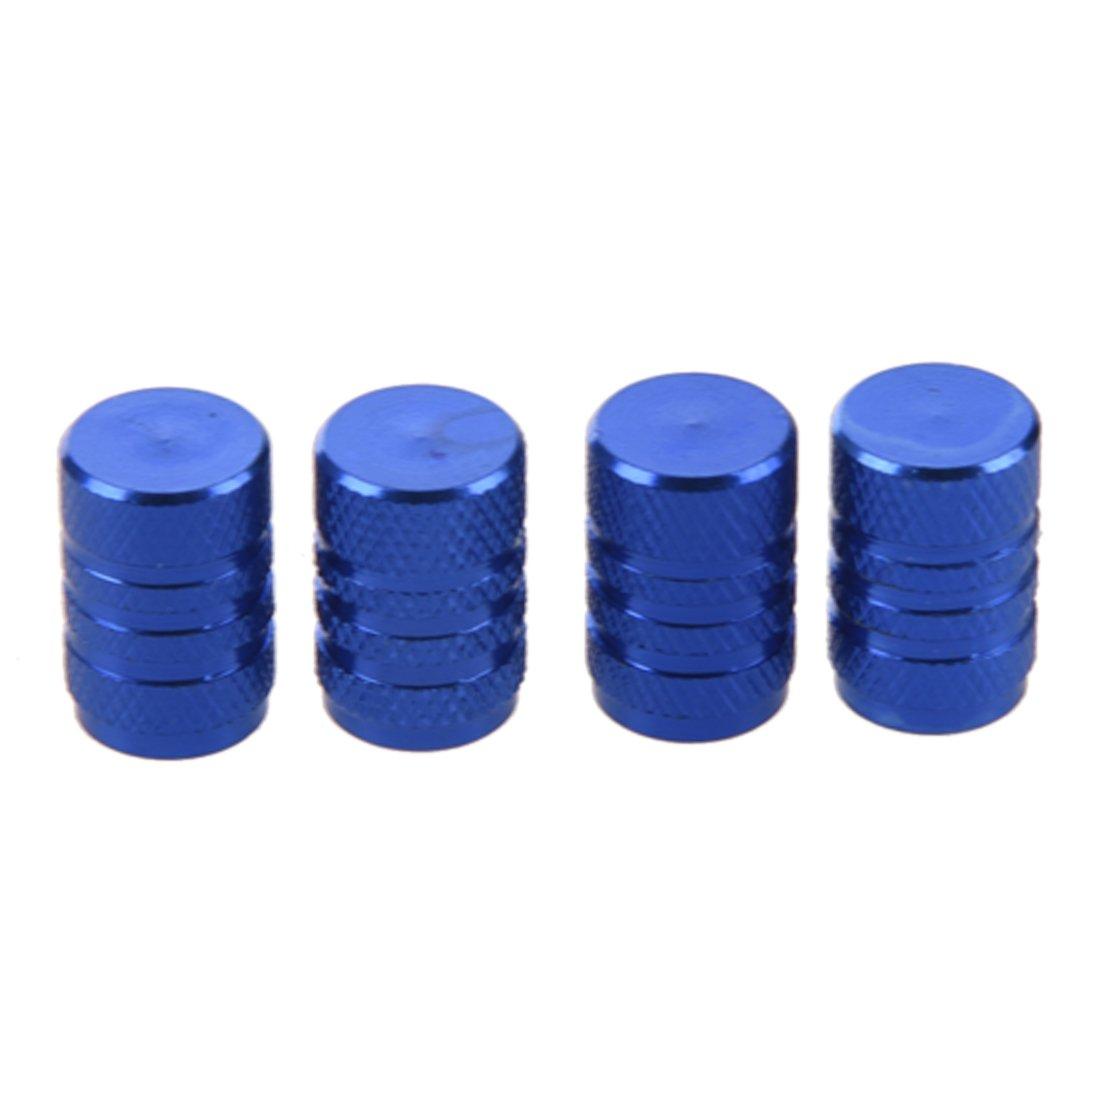 Autoreifen Ventilkappen - SODIAL(R) 4 Stuecke blau Legierung Auto Reifen Ventilkappen Autoventil Verschlusskappen SODIAL£¨R£© 058157